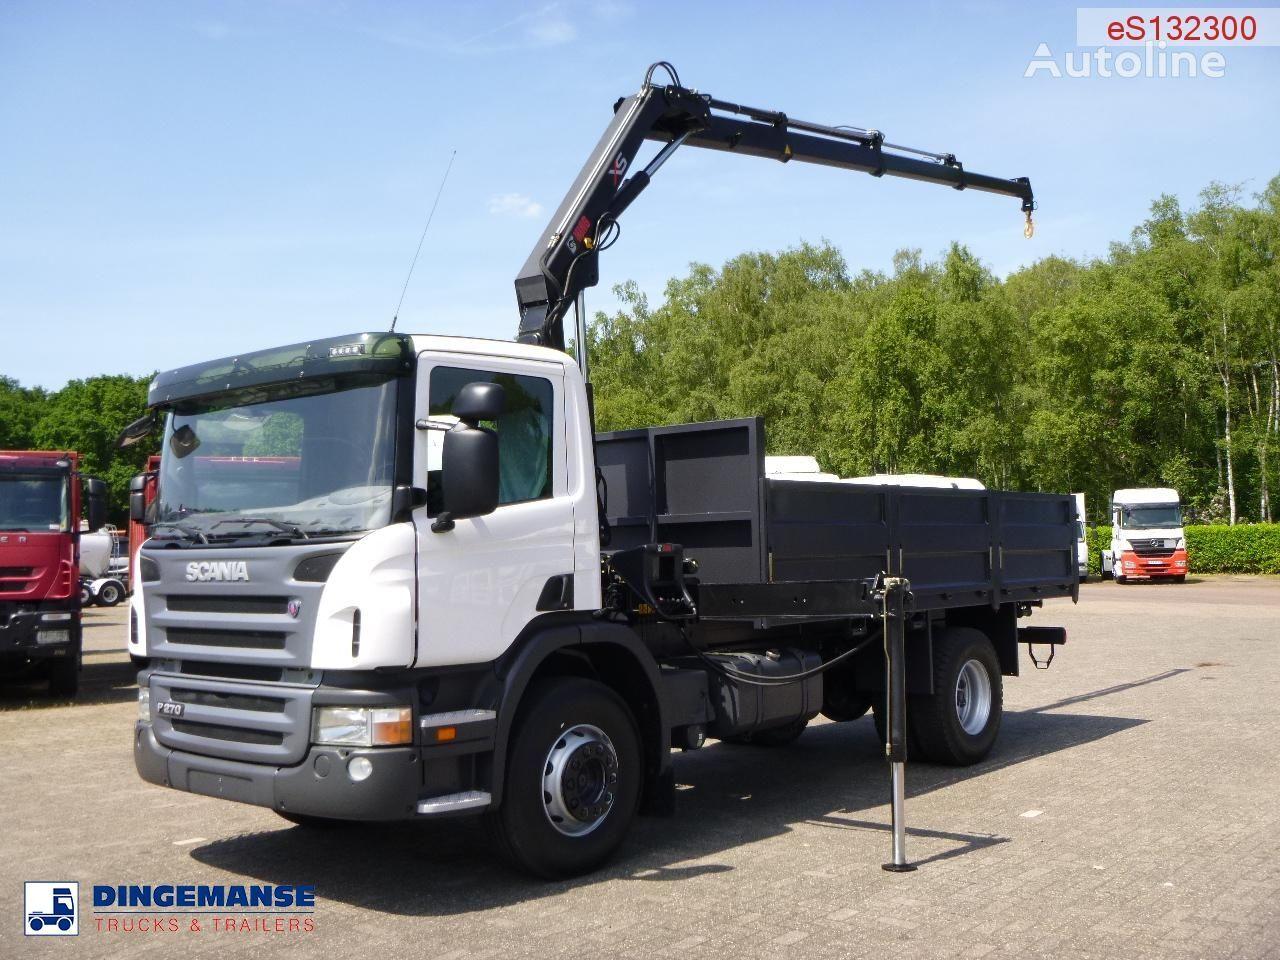 nov tovornjak tovorna ploščad SCANIA P270 LB 4X2 Hiab XS 099 B-3 Duo / NEW/UNUSED